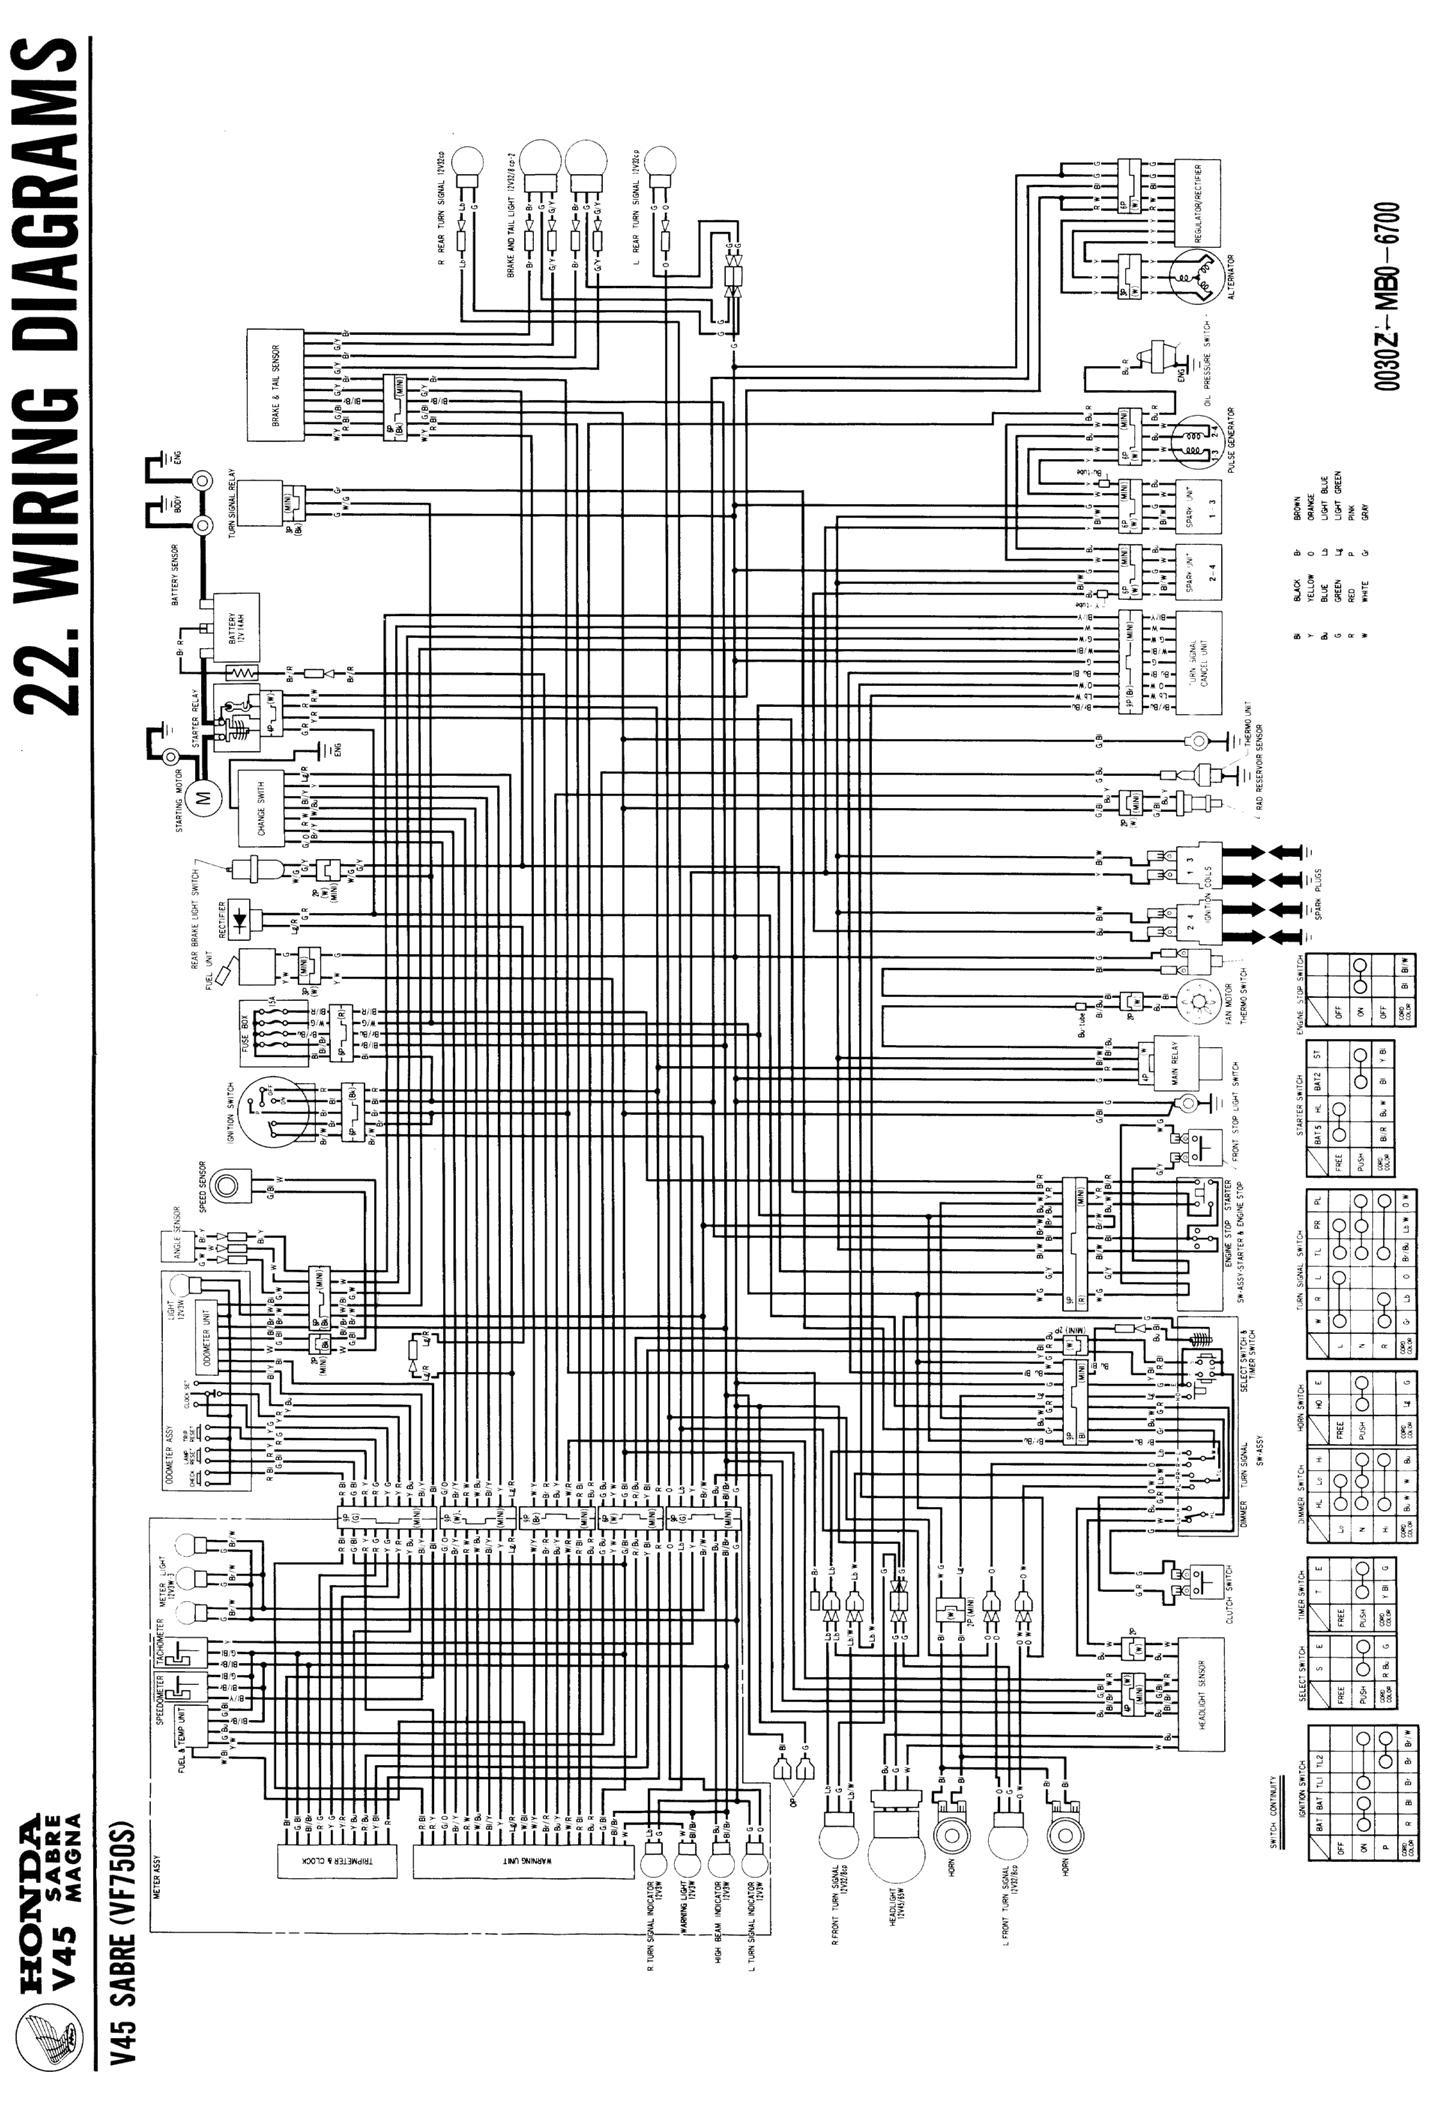 1982 Honda v45 magna wiring diagram